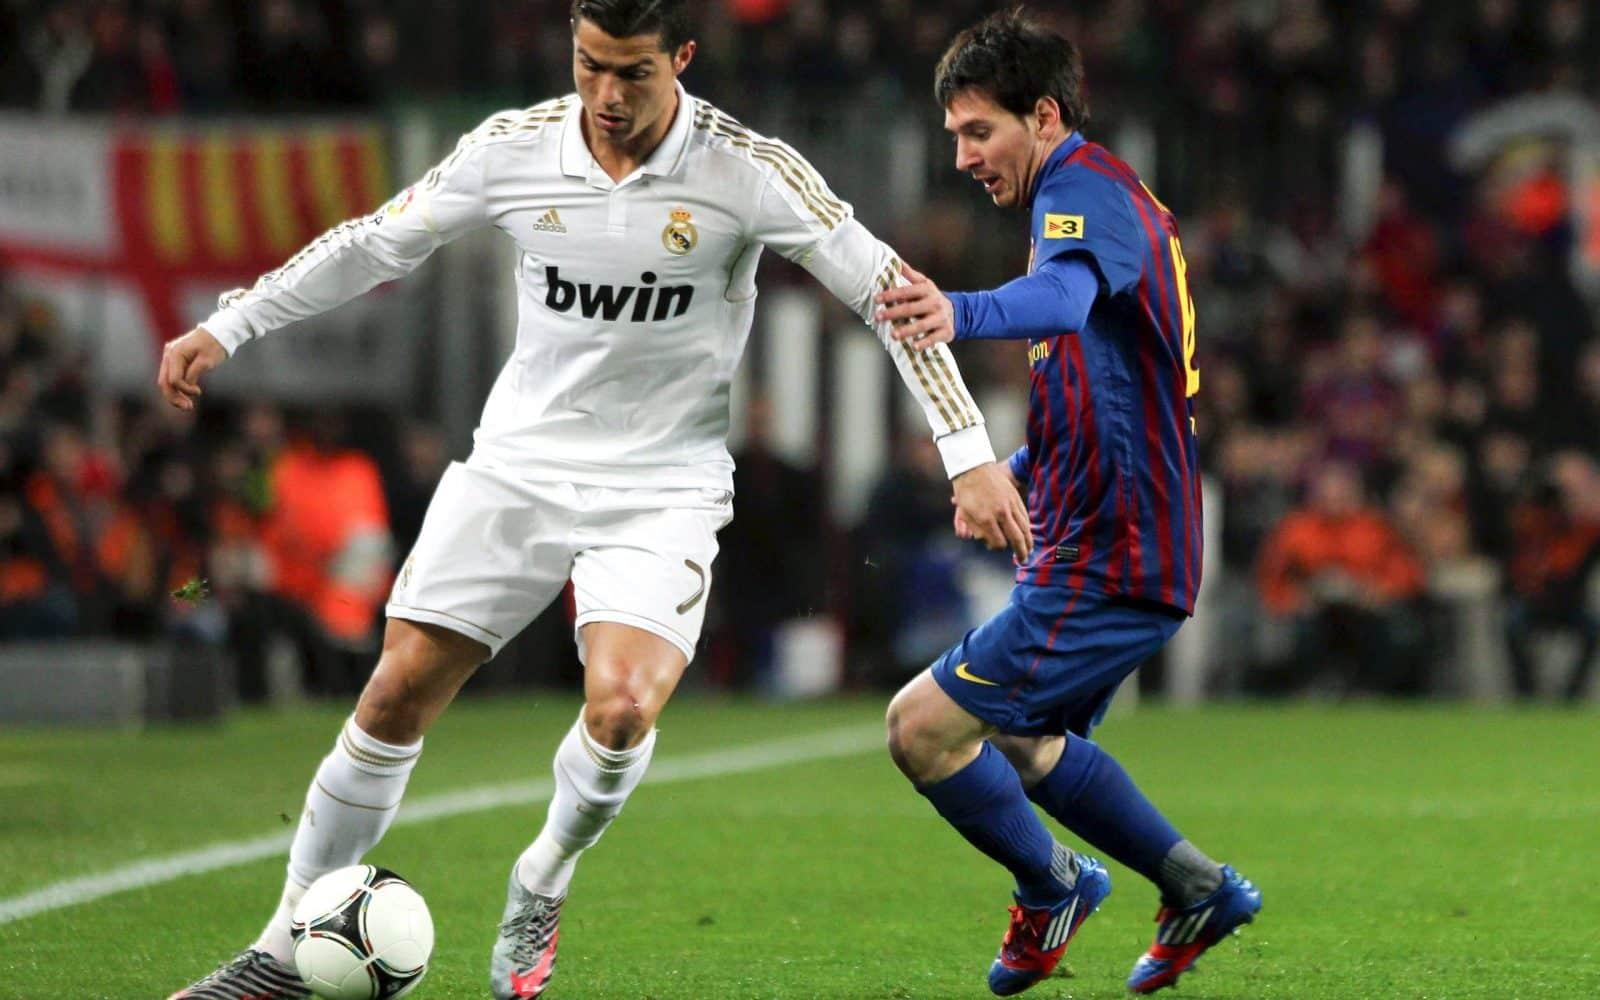 Cristiano Ronaldo, más rico que Messi